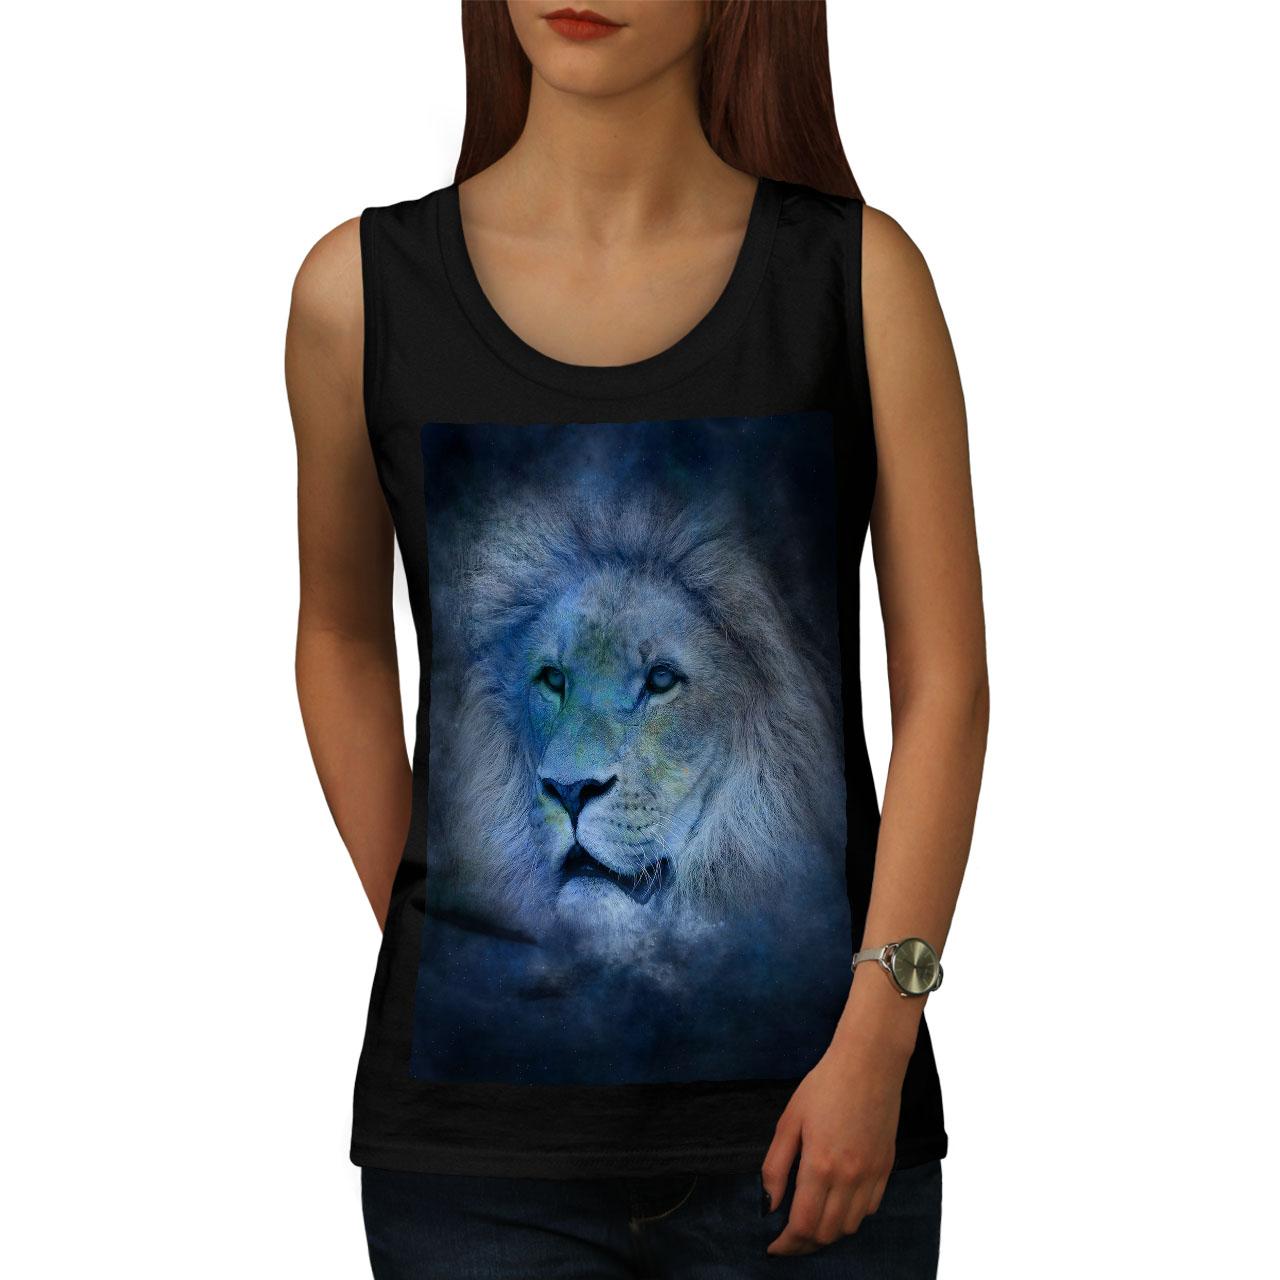 Wellcoda Lion Cat Face Art Womens V-Neck T-shirt Ruler Graphic Design Tee